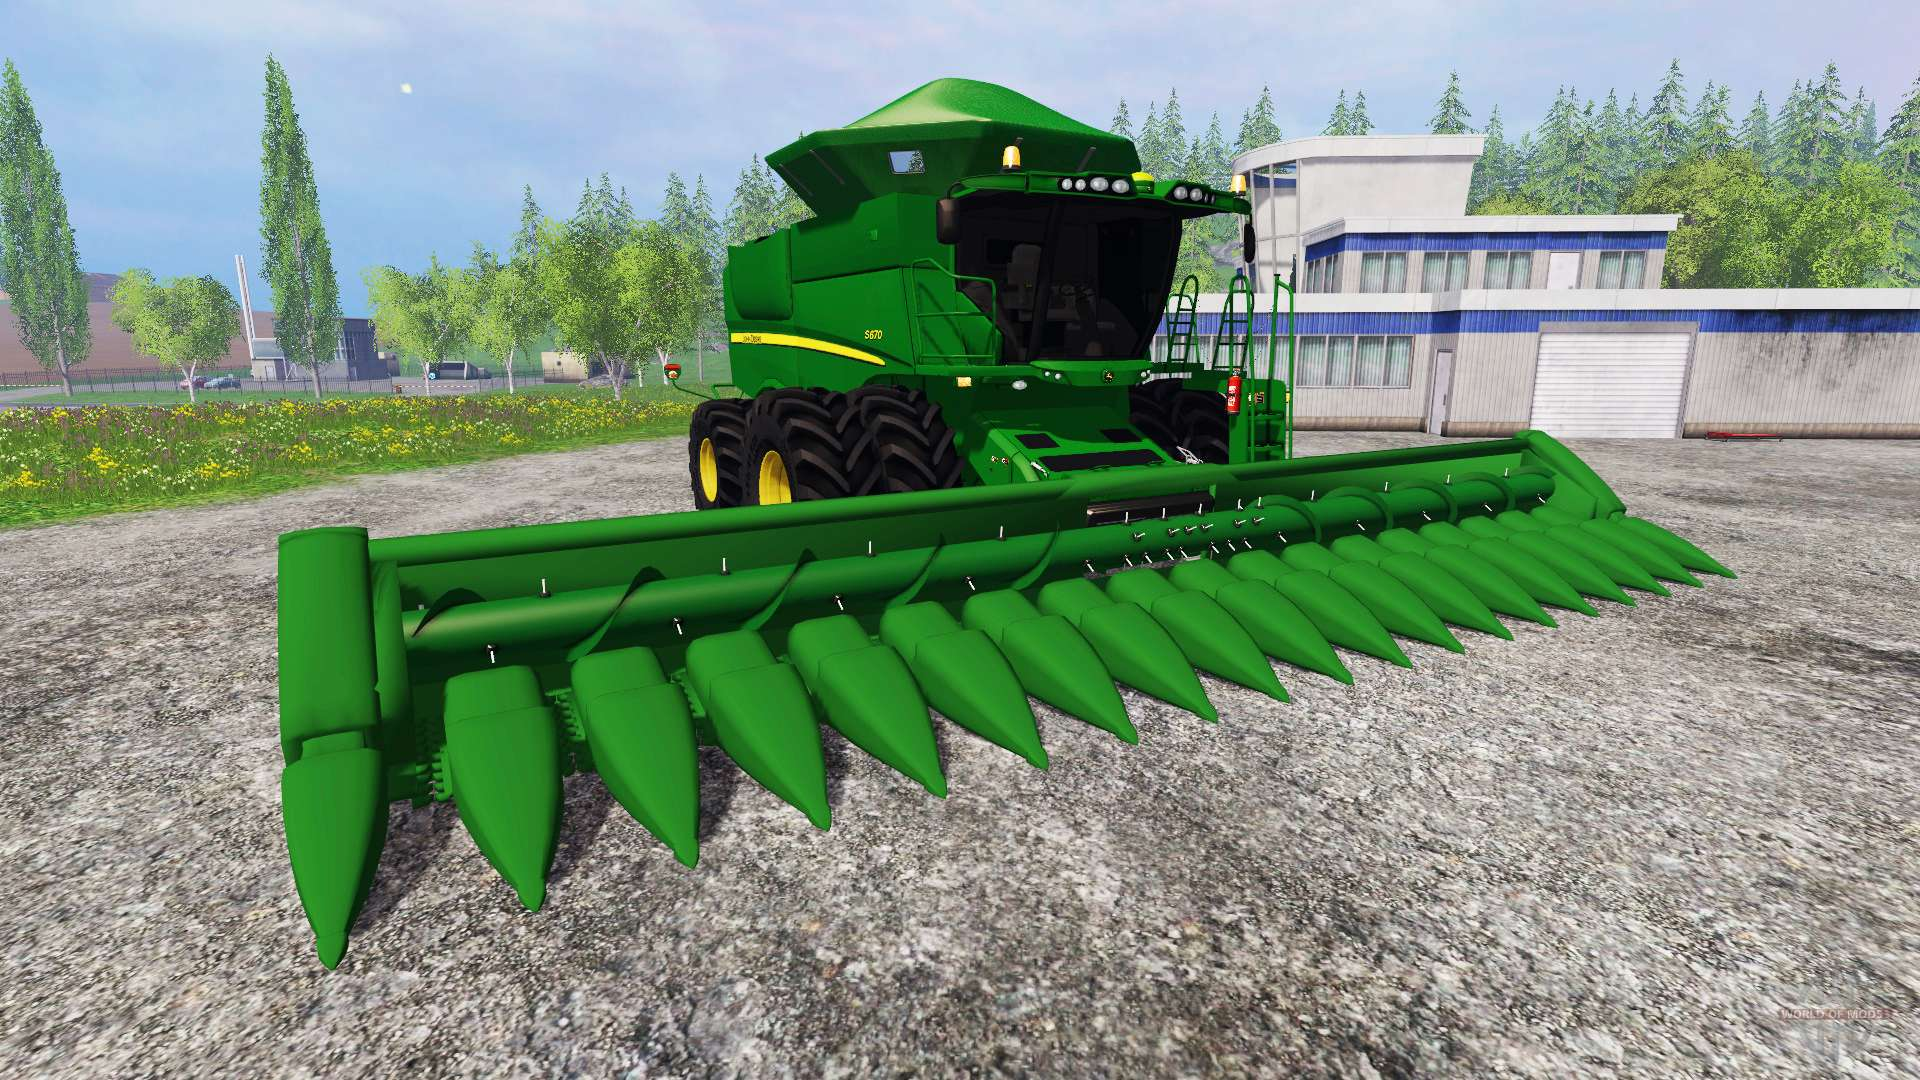 farm fuel filters john deere s670 for farming simulator 2015  john deere s670 for farming simulator 2015